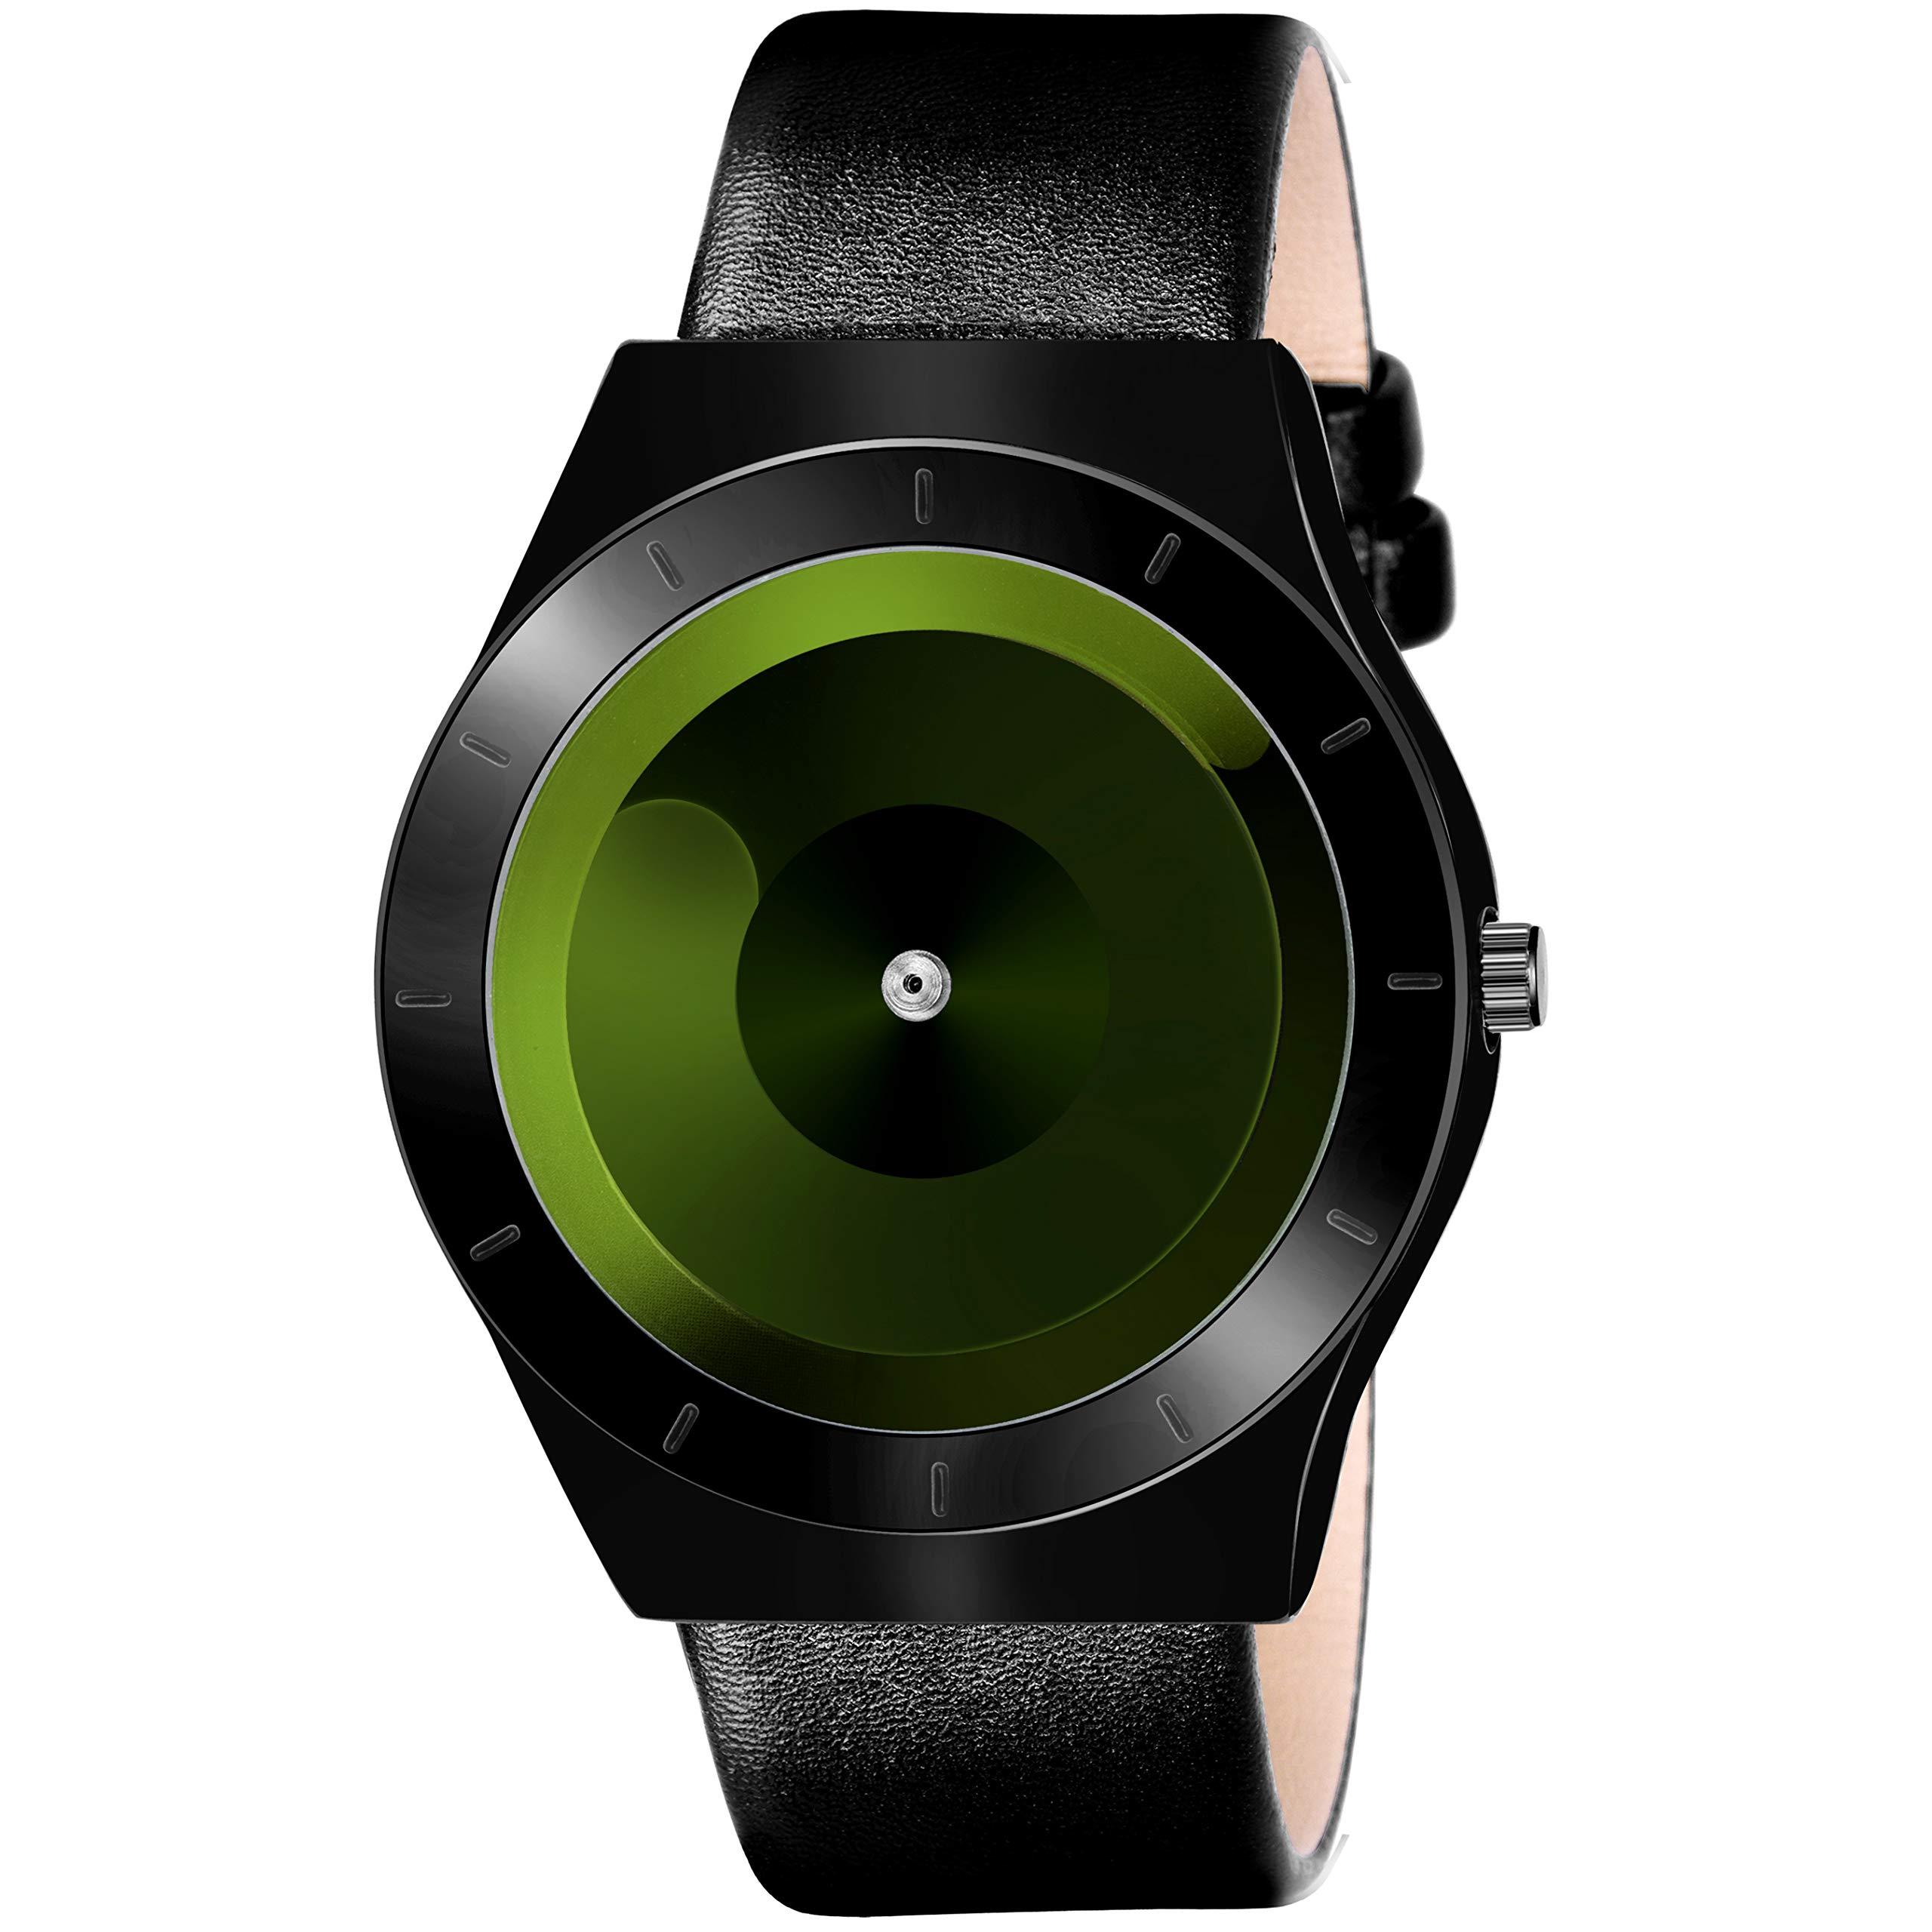 Lamkei LAM-1262 Analogue Unique Green Dial Black Leather Strap Watch for Men (B07Y8MHCZC) Amazon Price History, Amazon Price Tracker